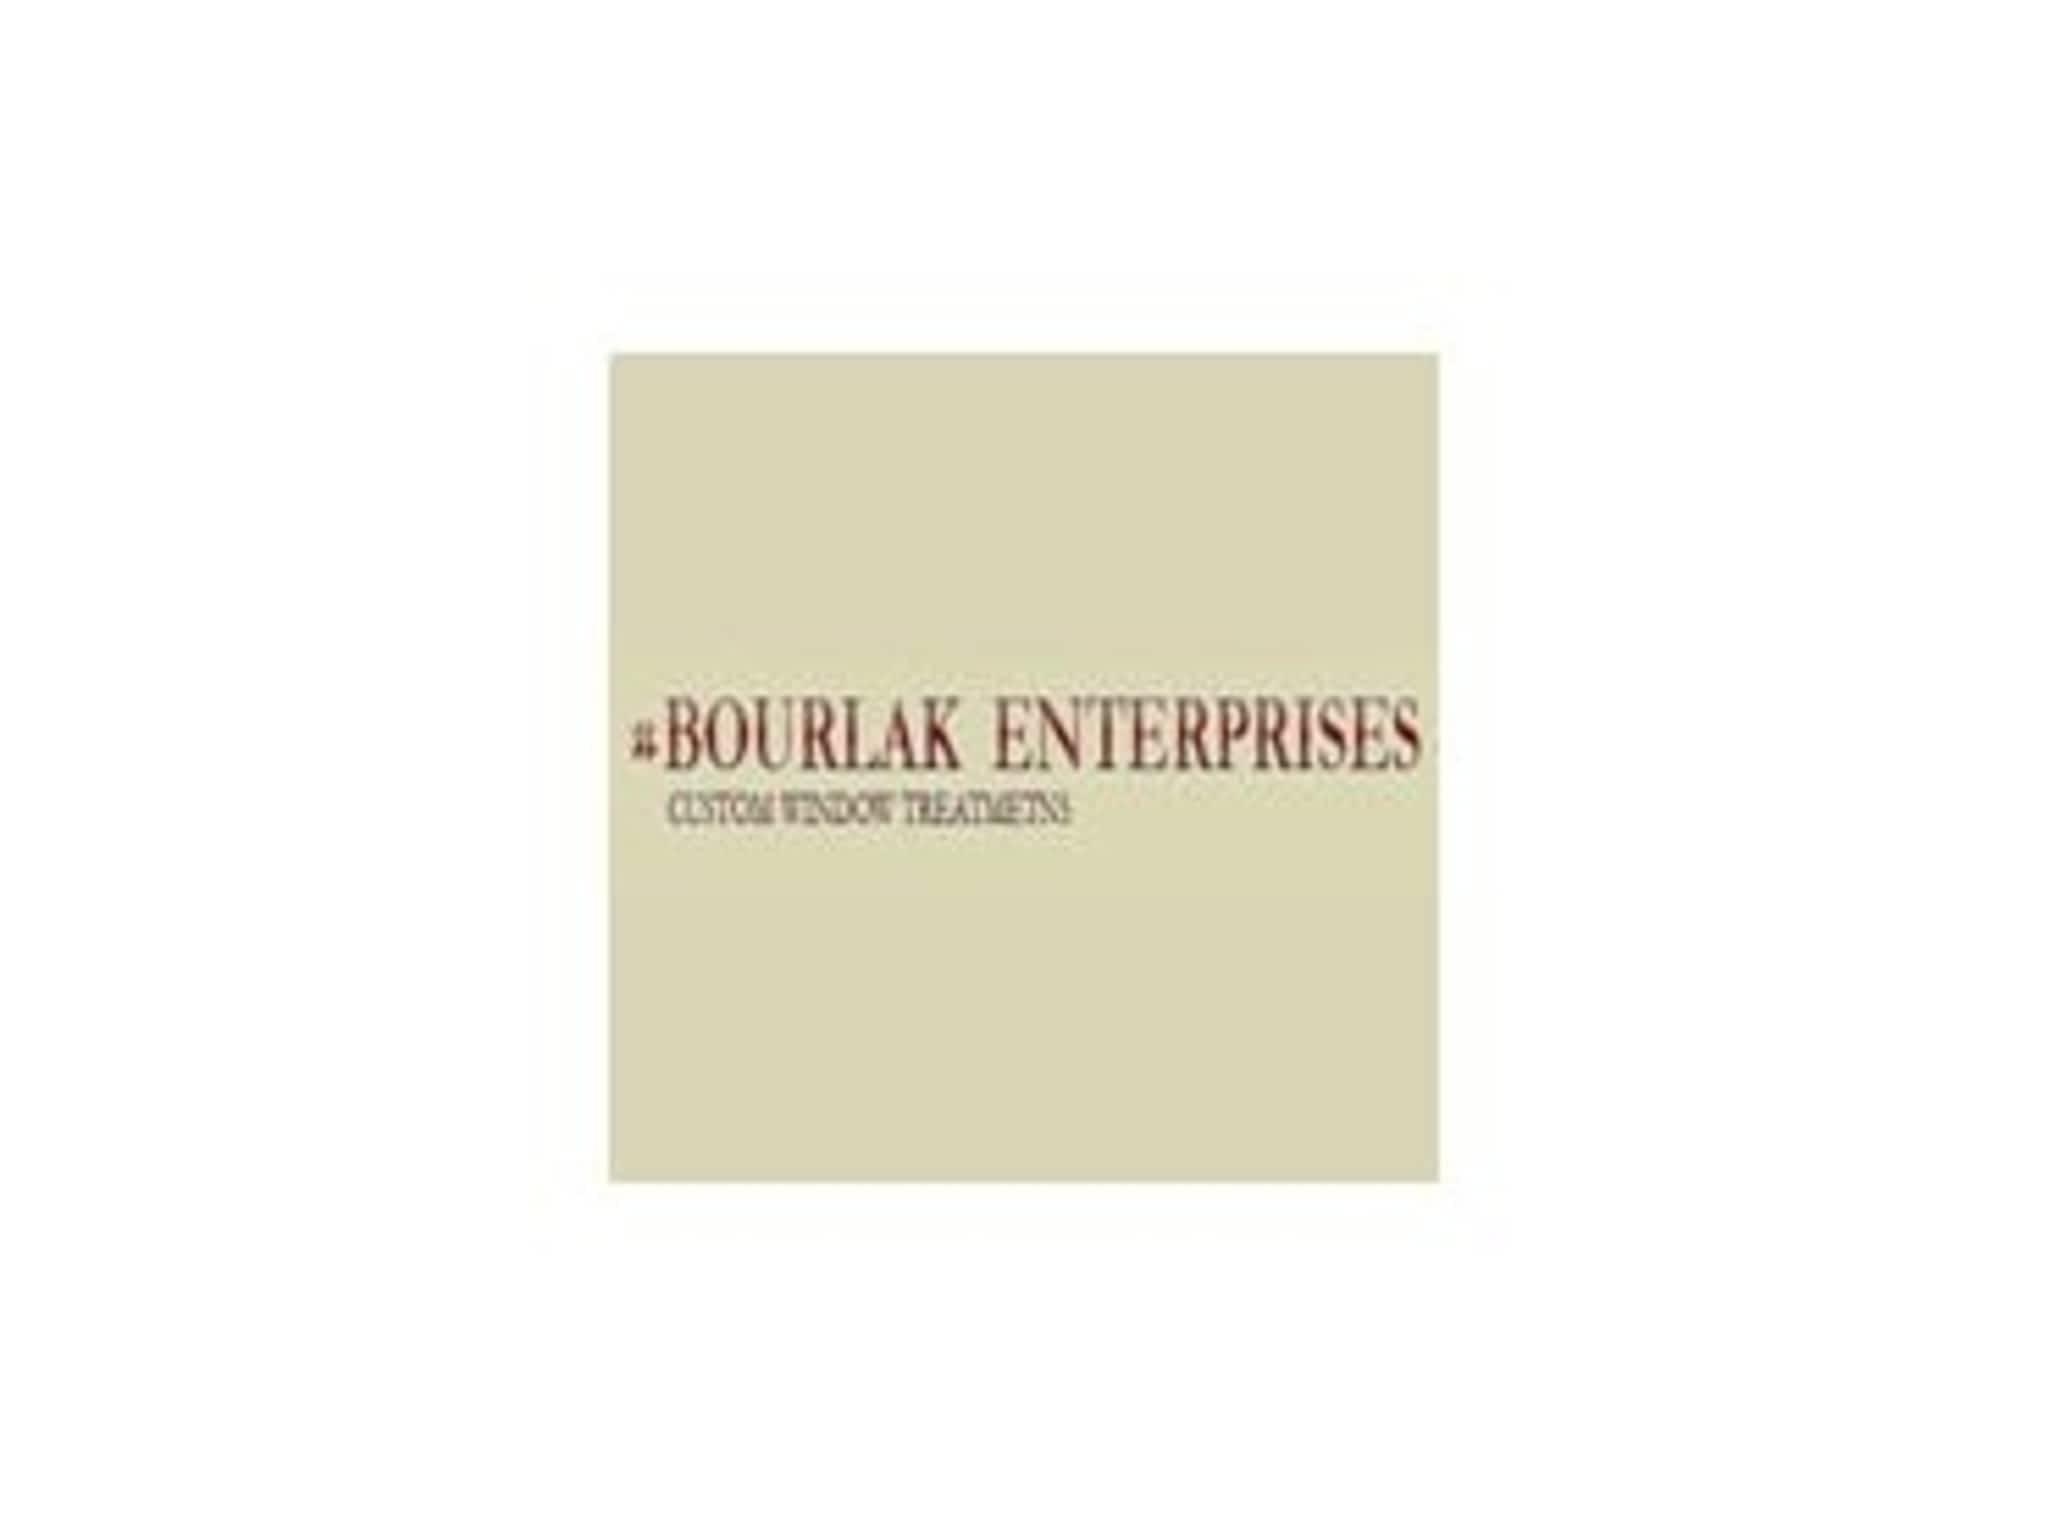 photo Bourlak Enterprises